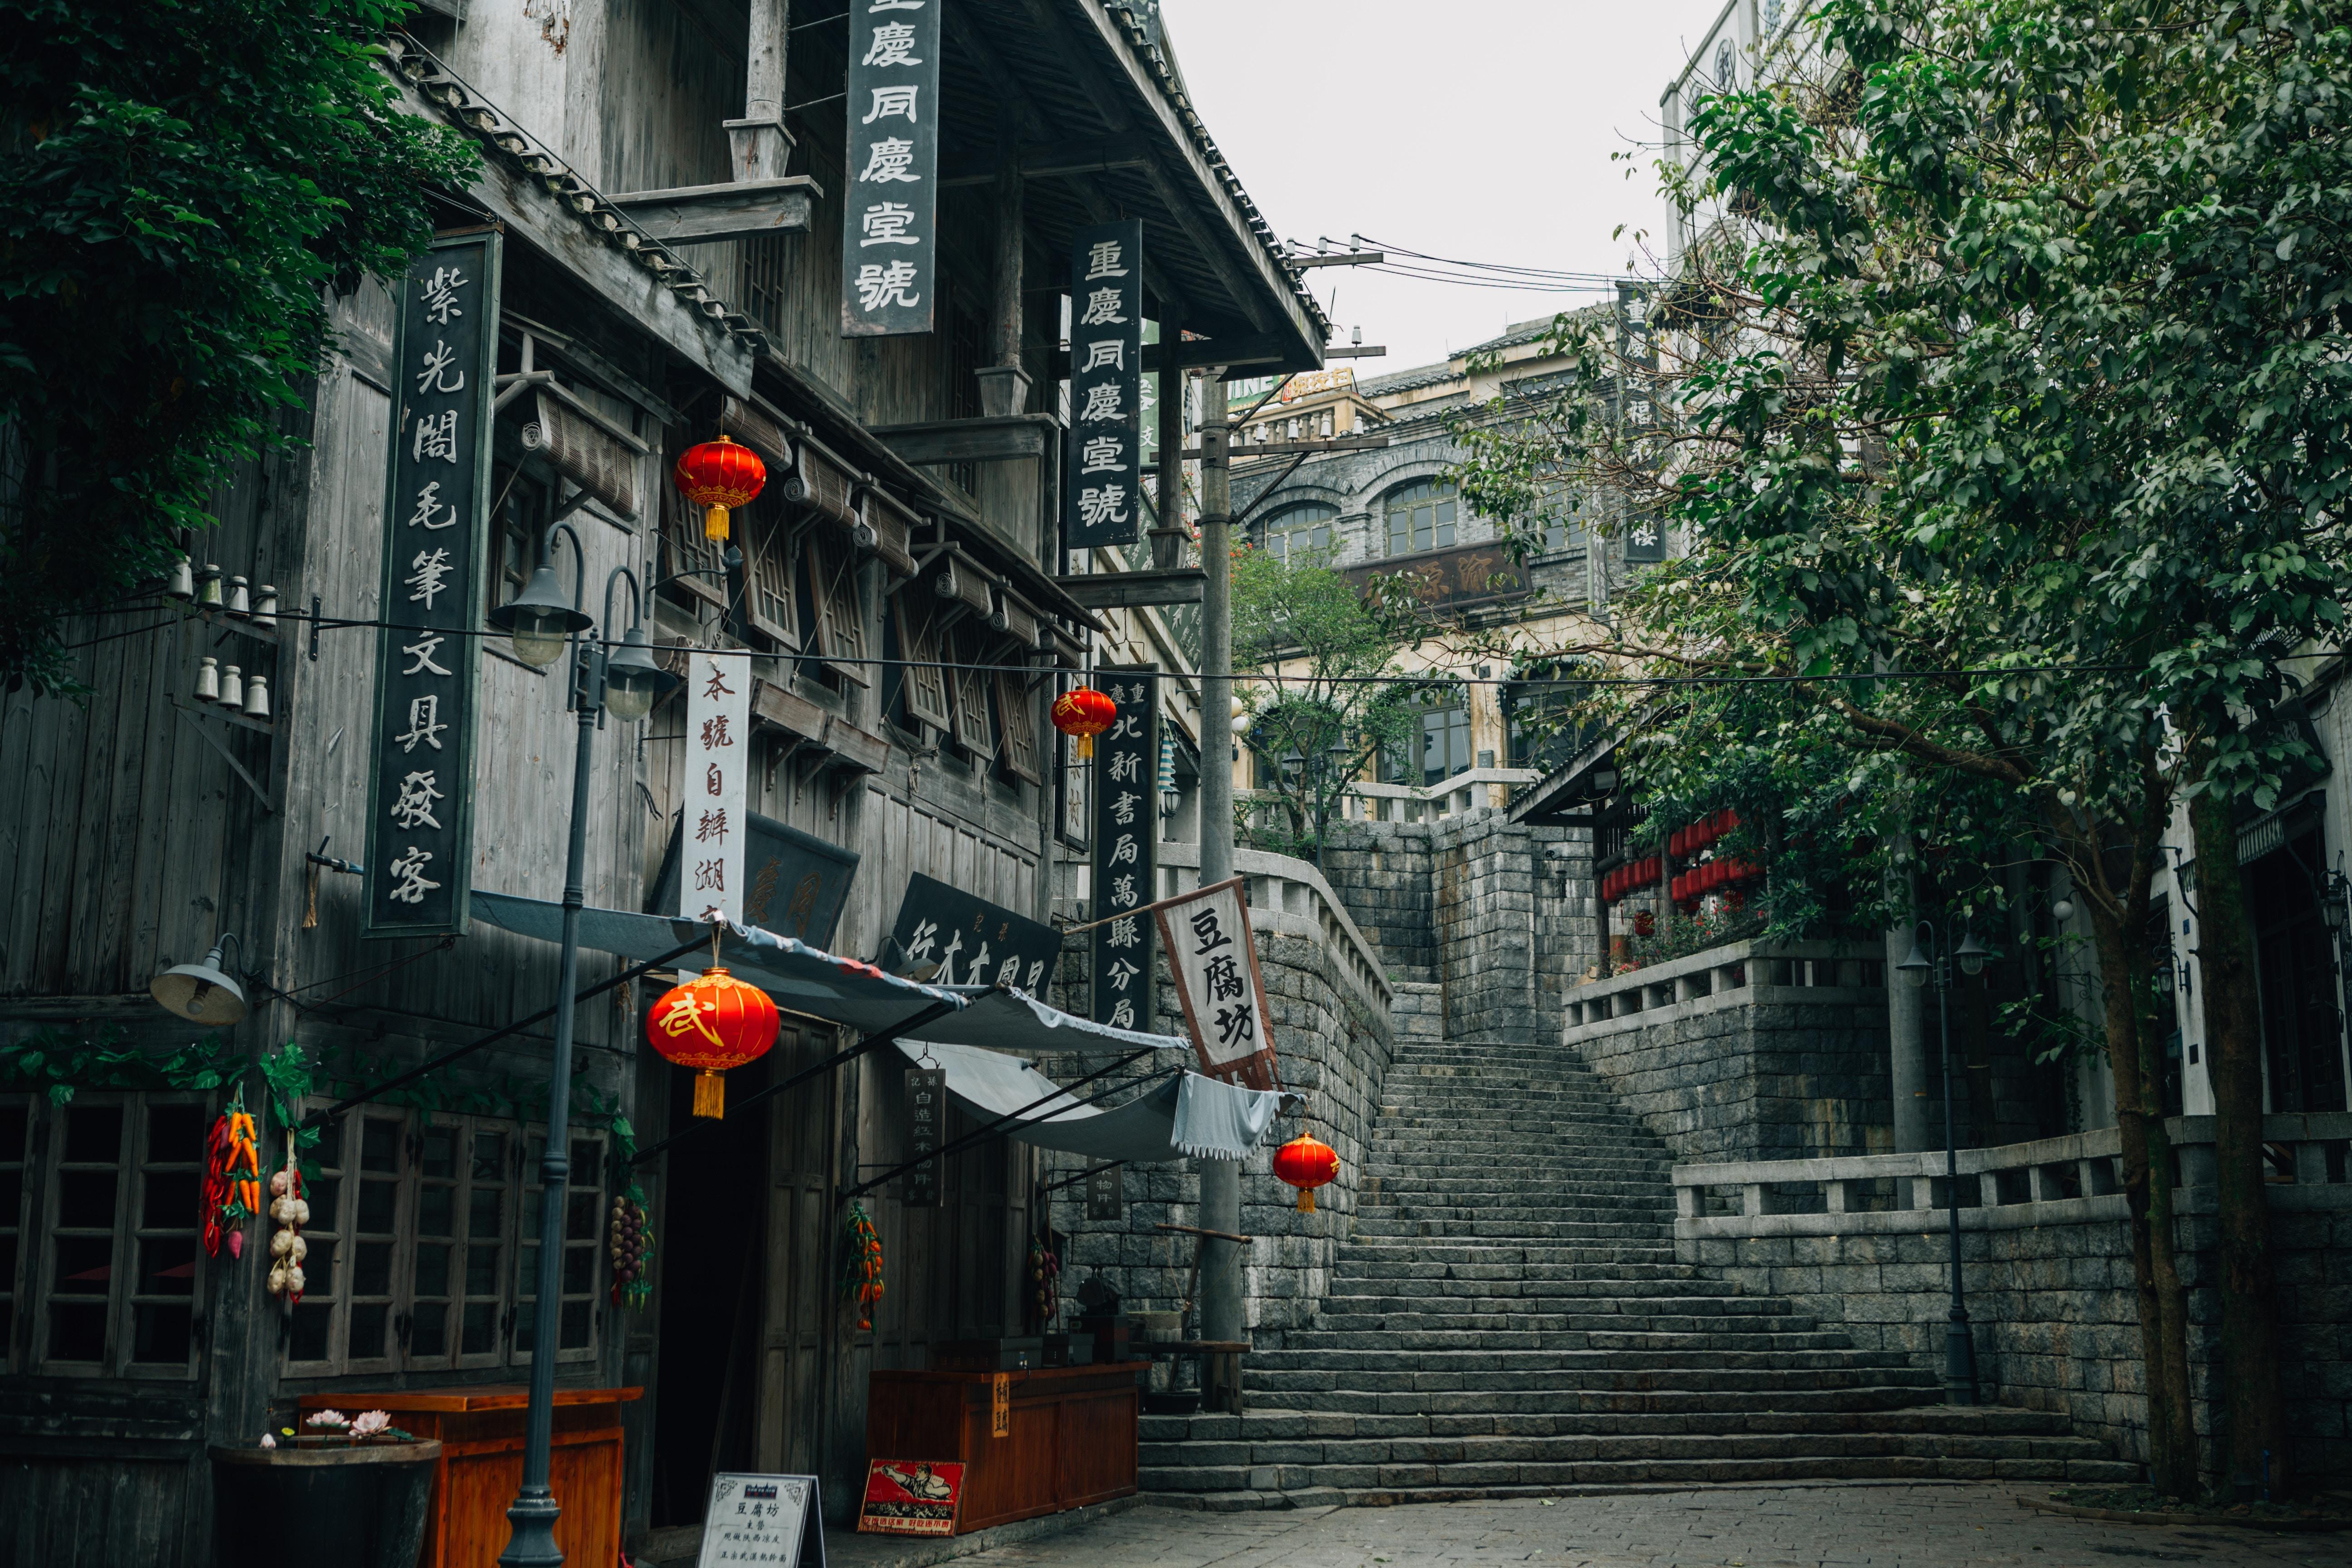 nouvel an chinois digital opportunités